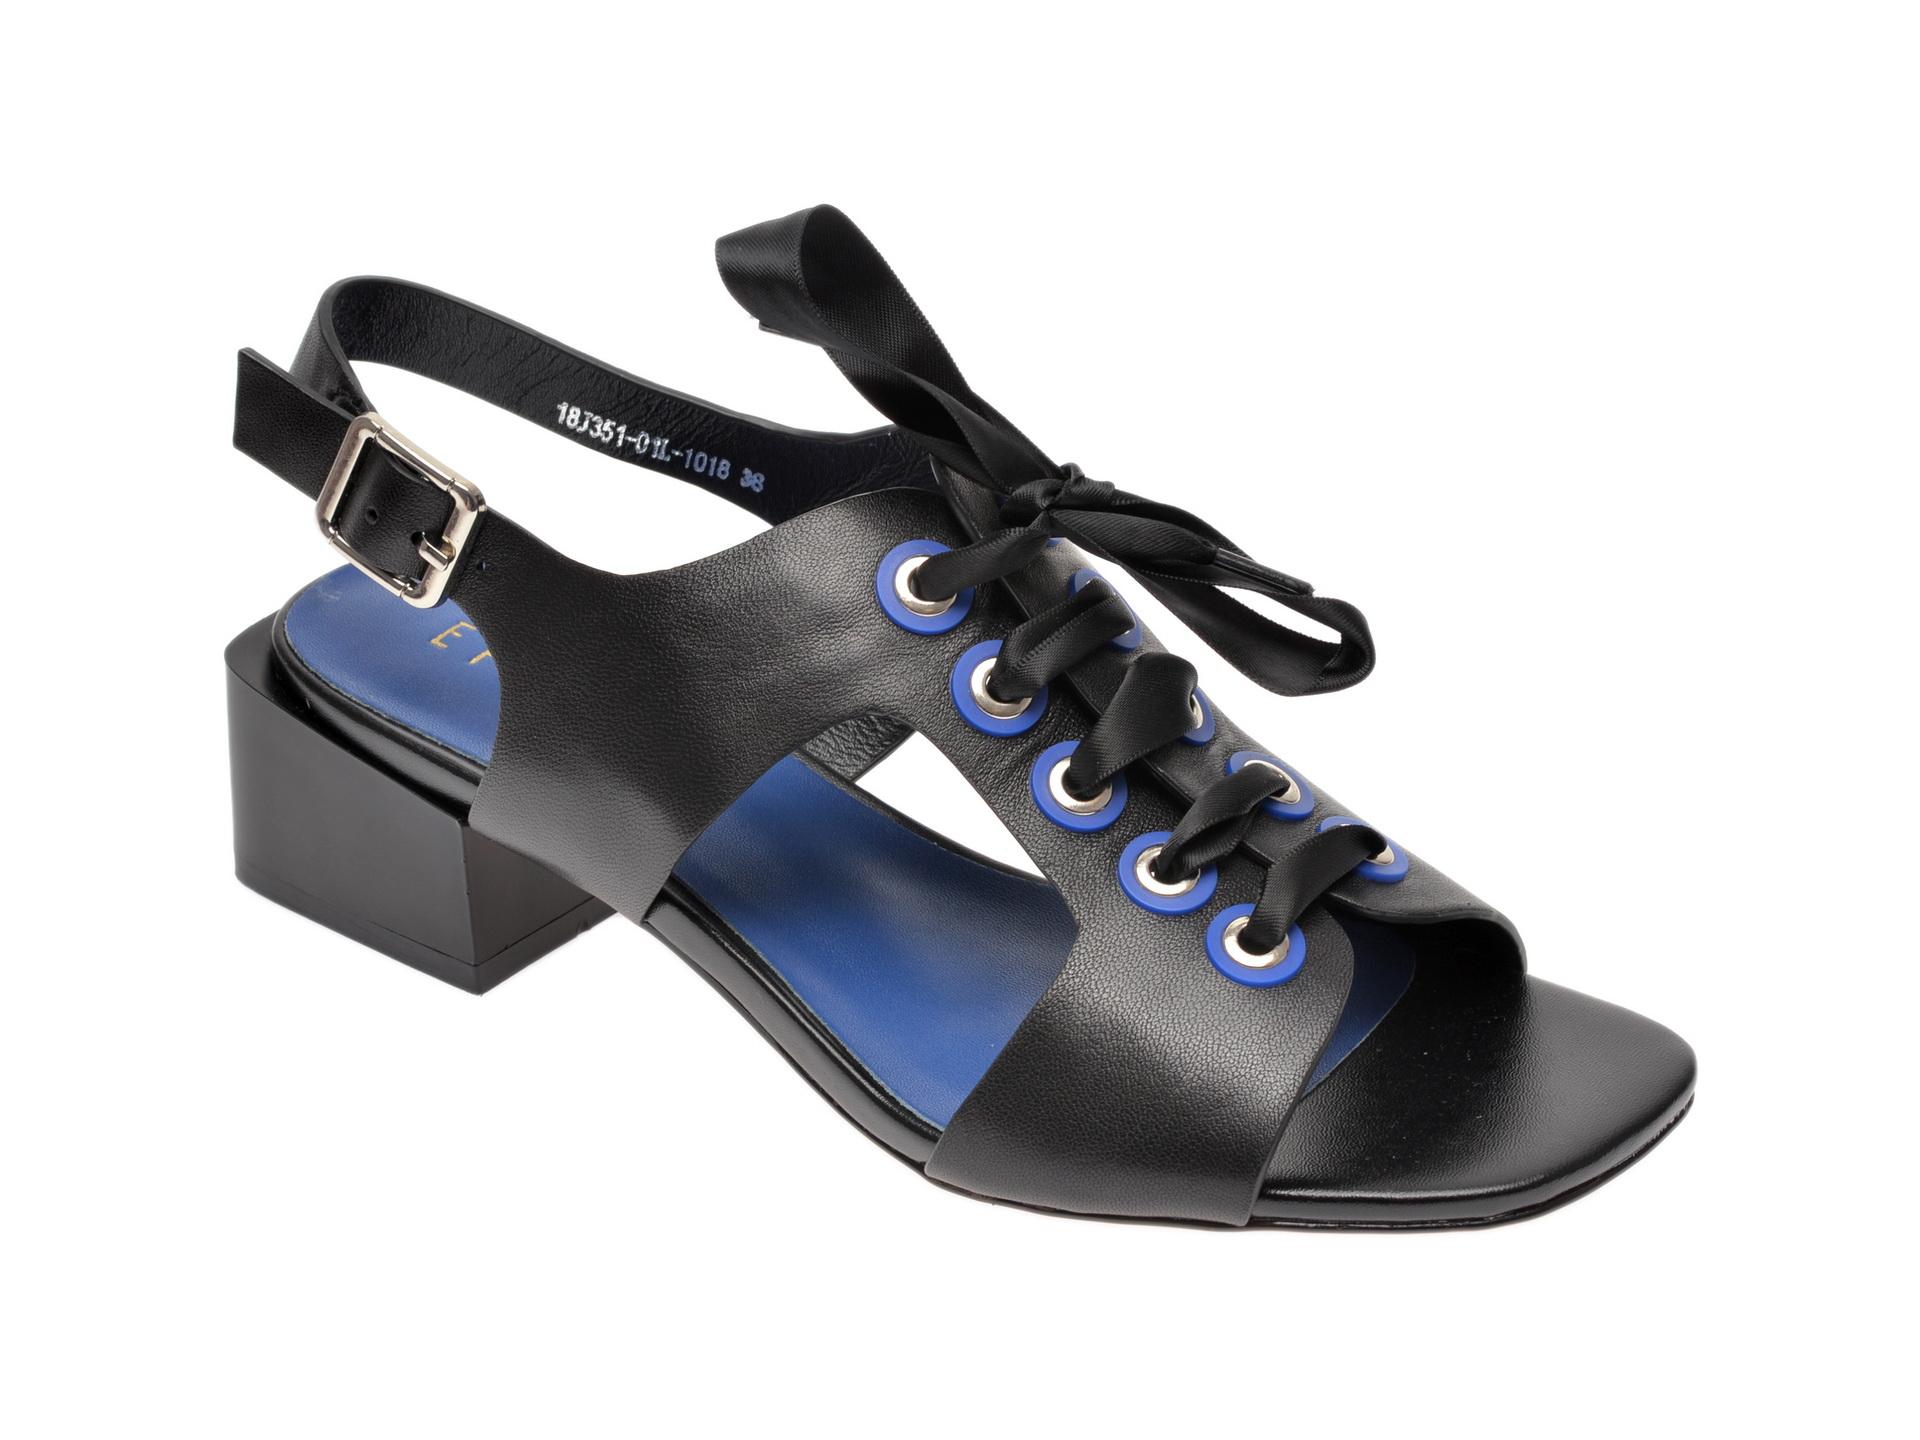 Sandale EPICA negre, 18J3510, din piele naturala imagine